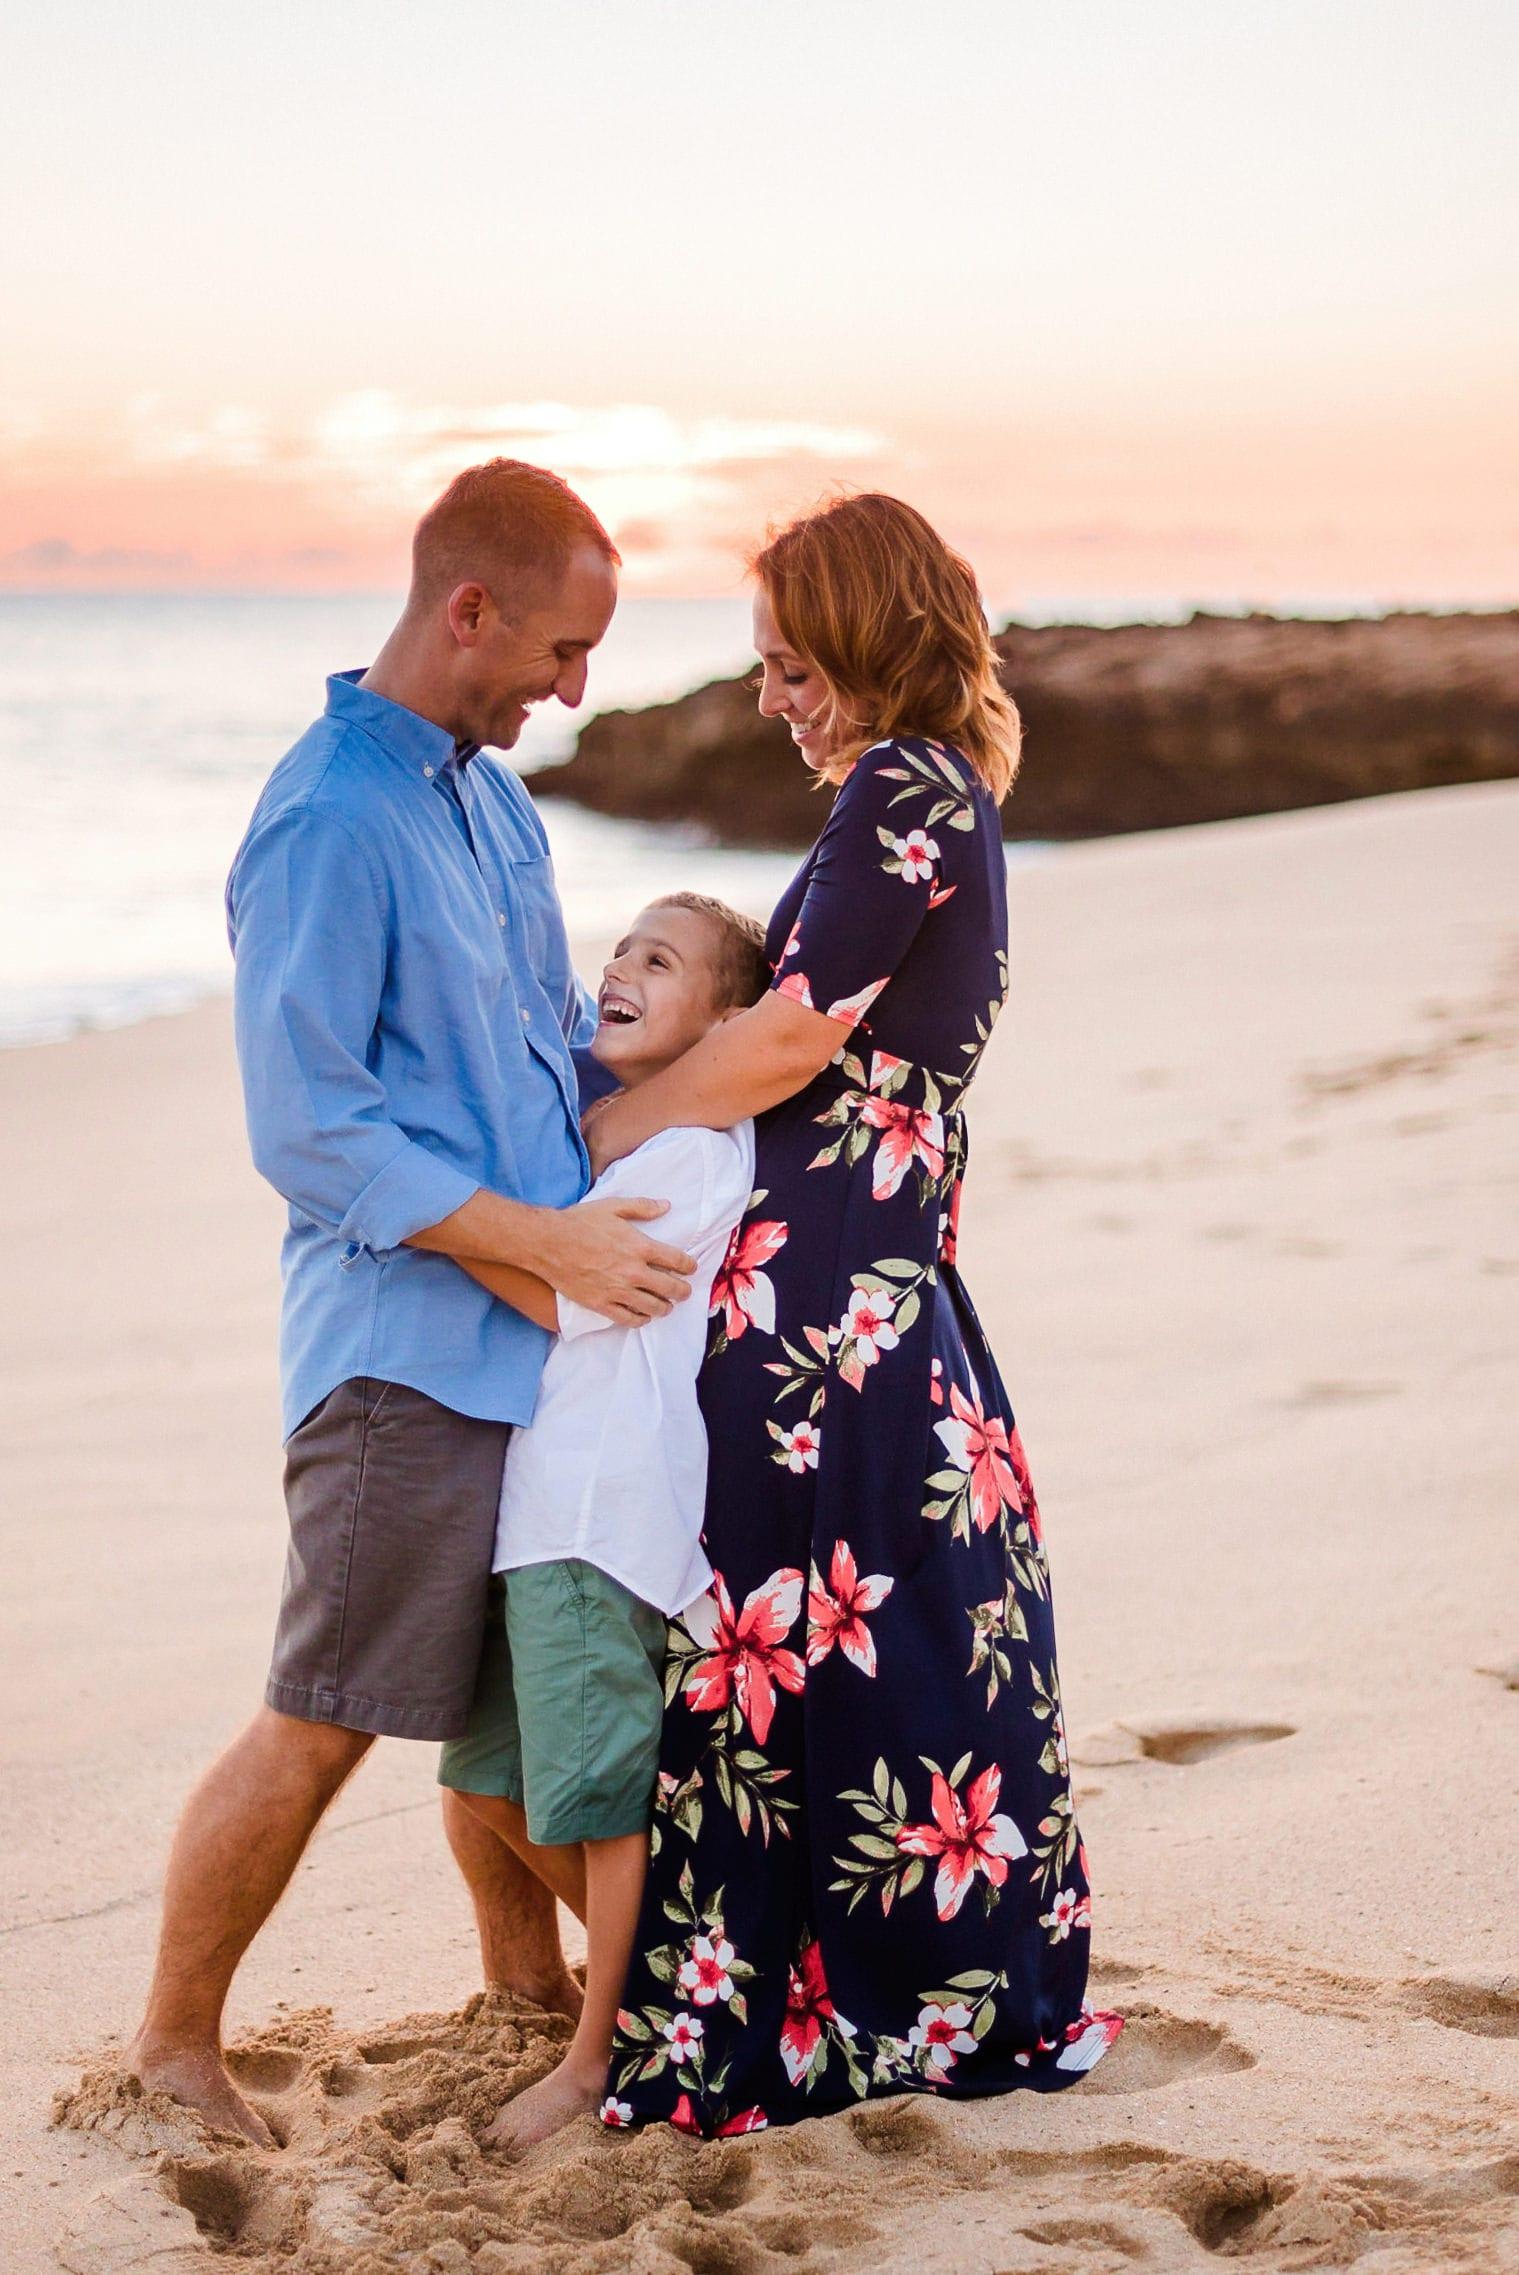 Big-Island-Best-Family-Photographer-Beach-Sunset-12.jpg